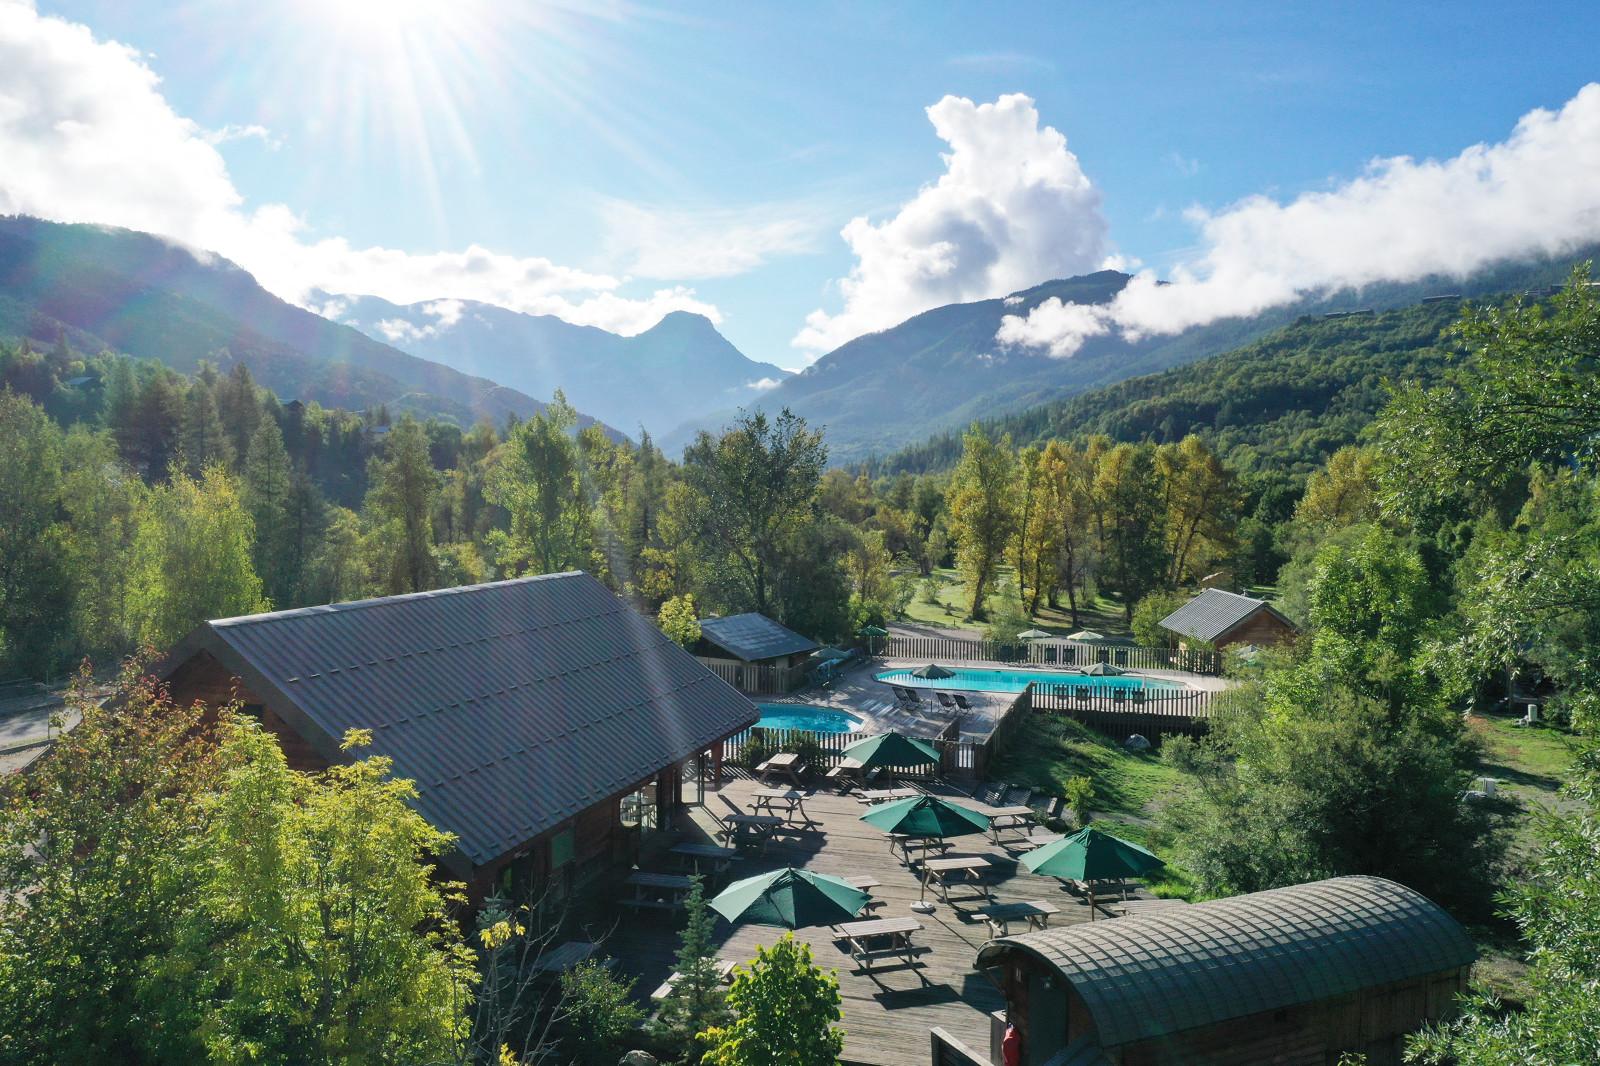 Camping Huttopia Vallouise, Vallouise, Hautes-Alpes